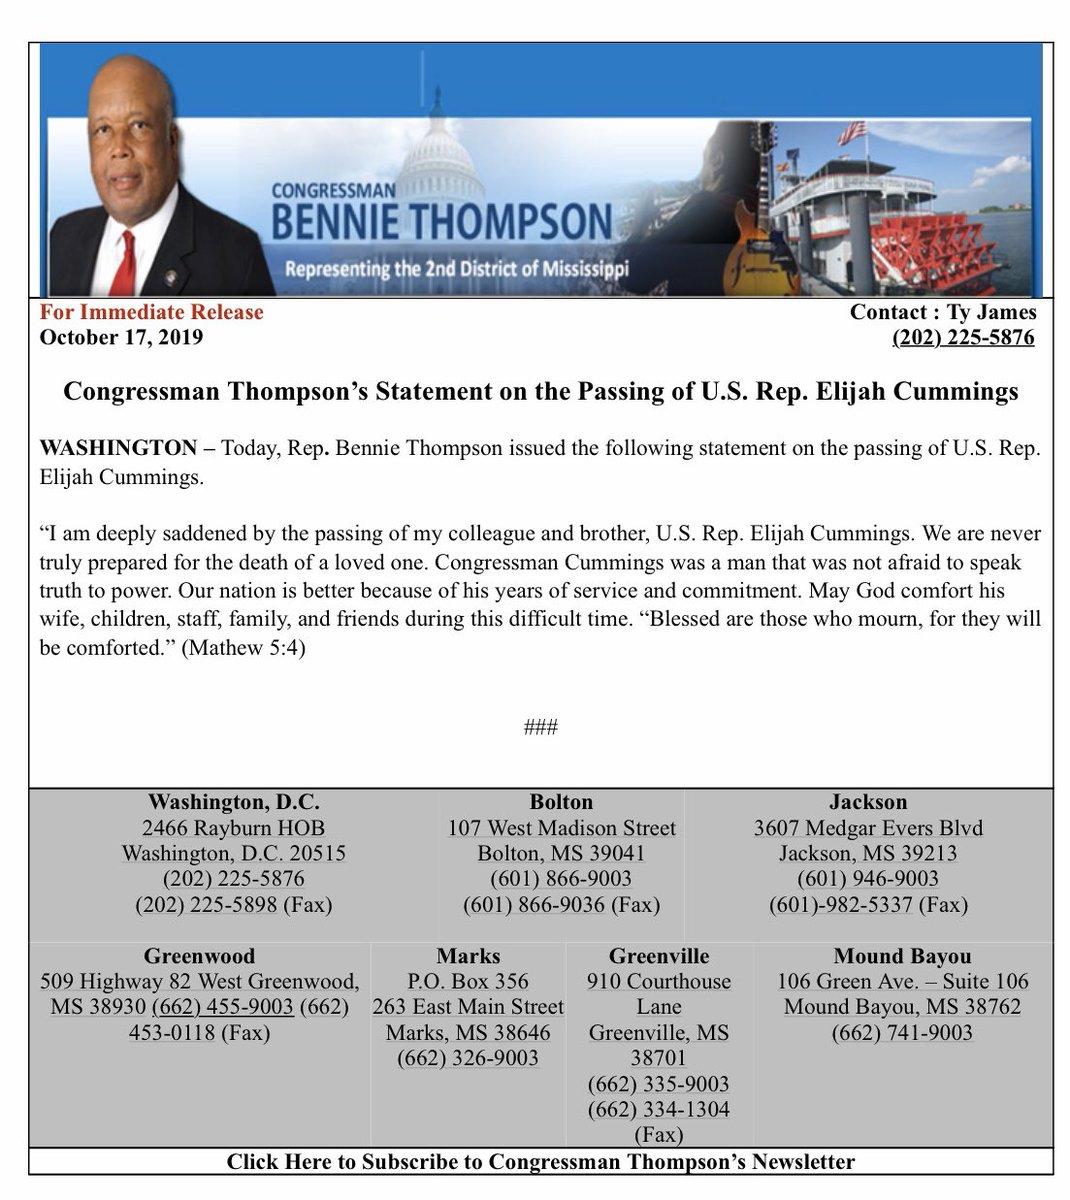 May U.S. Rep. Elijah Cummings Rest In Peace.